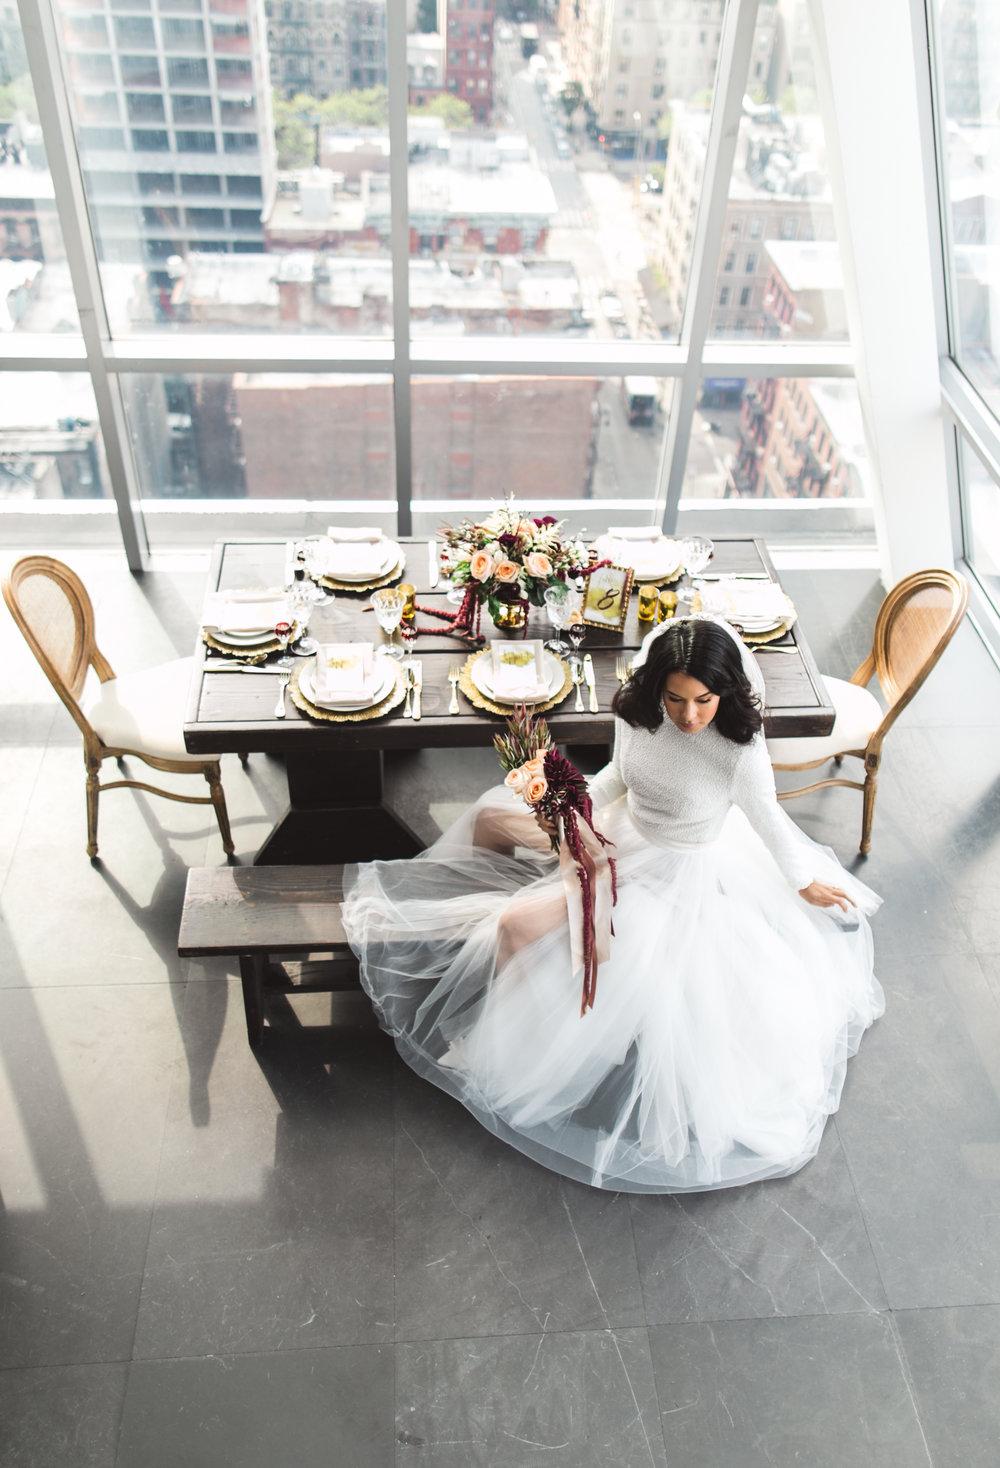 Nathalie Kraynina BrideBond_Girl_Bride_GinaEsposito-11.jpg